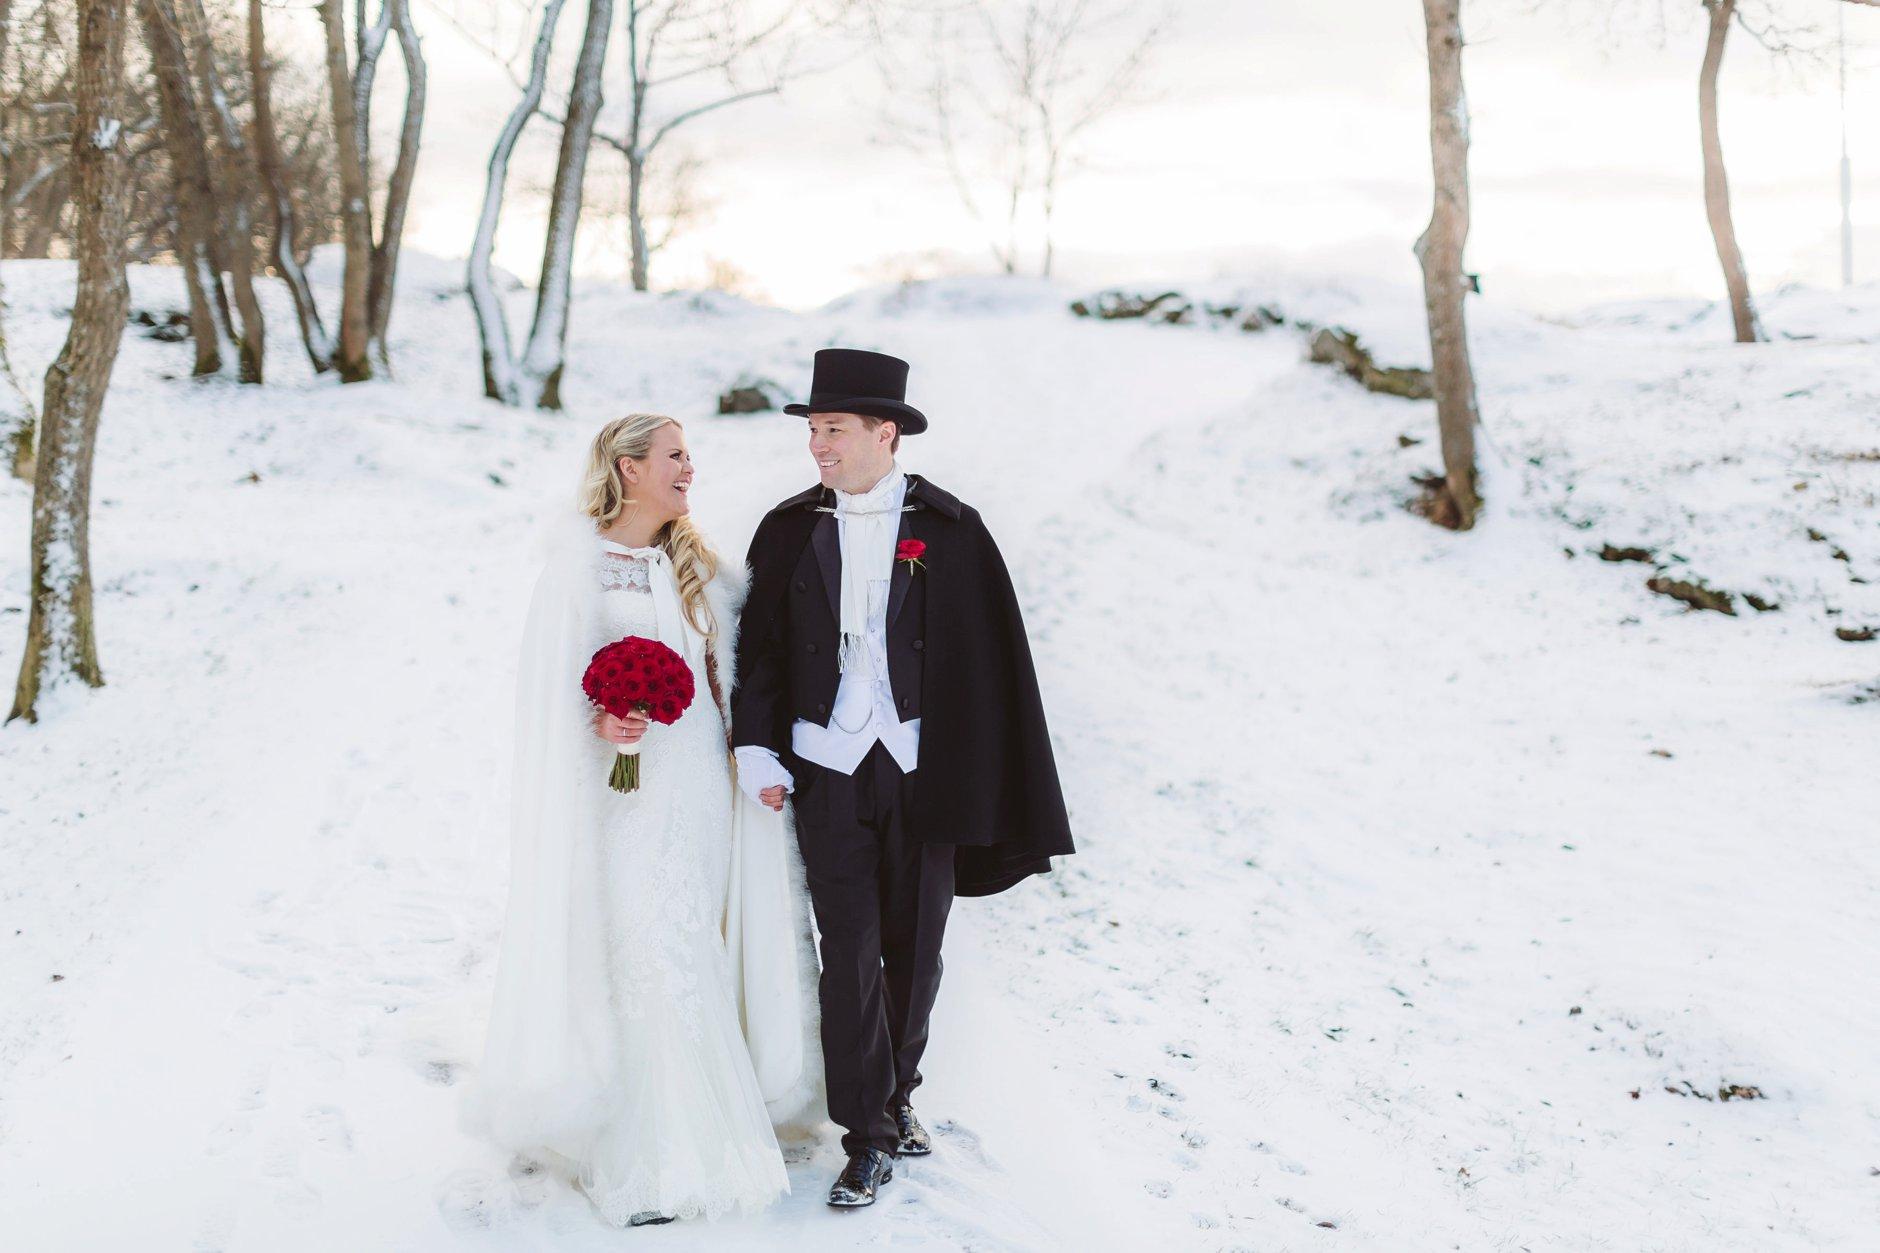 Vinterbryllup i Drøbak og Oscarsborg